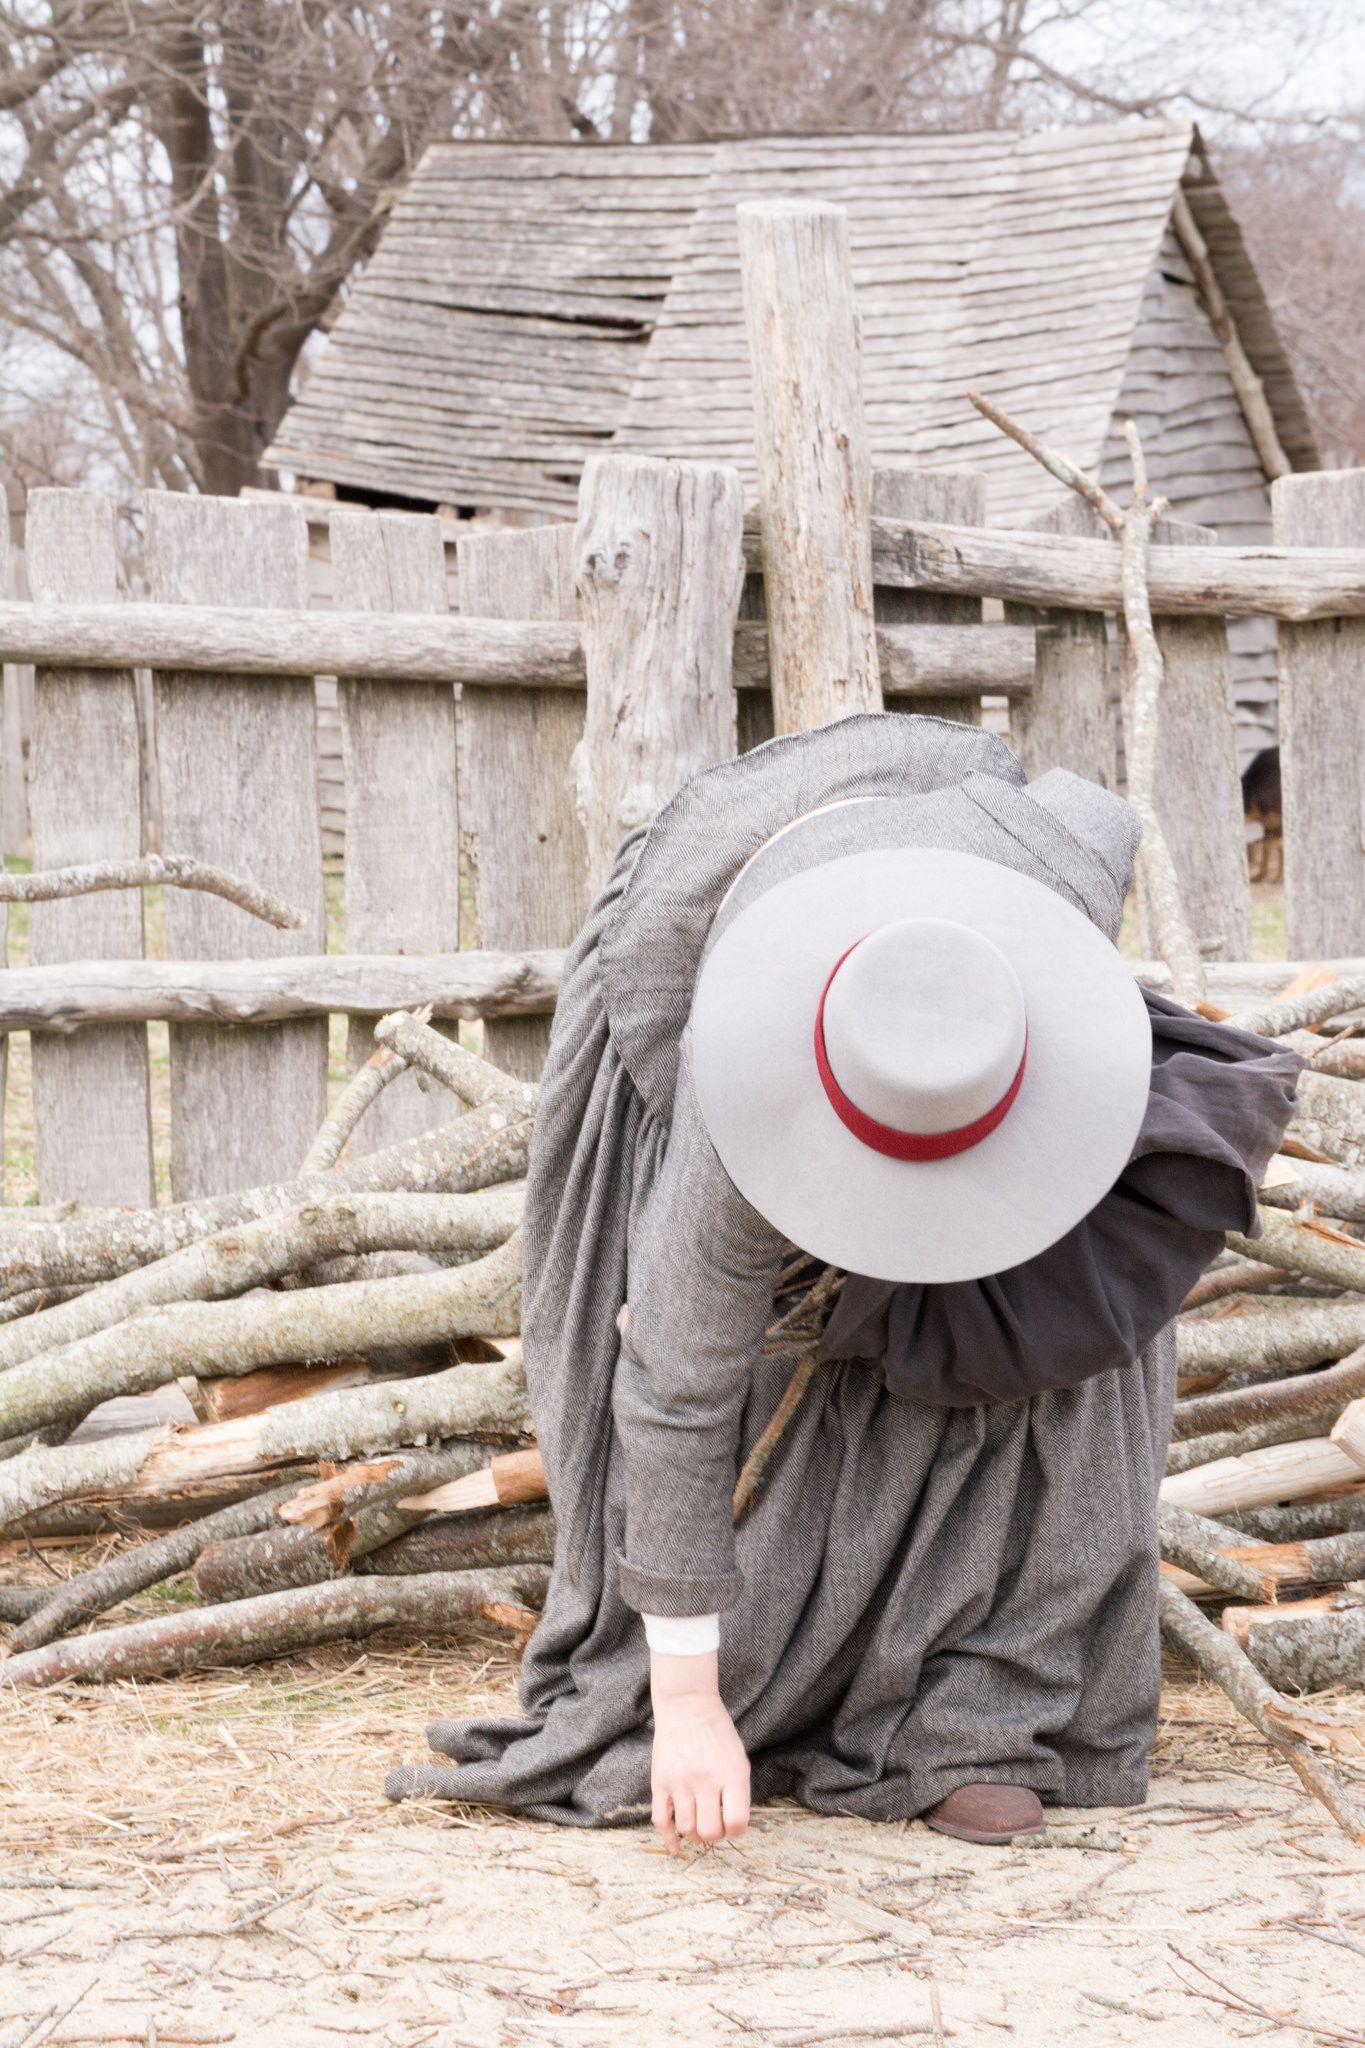 2014 04 09 Plimoth Plantation 305 Pilgrim Fathers and